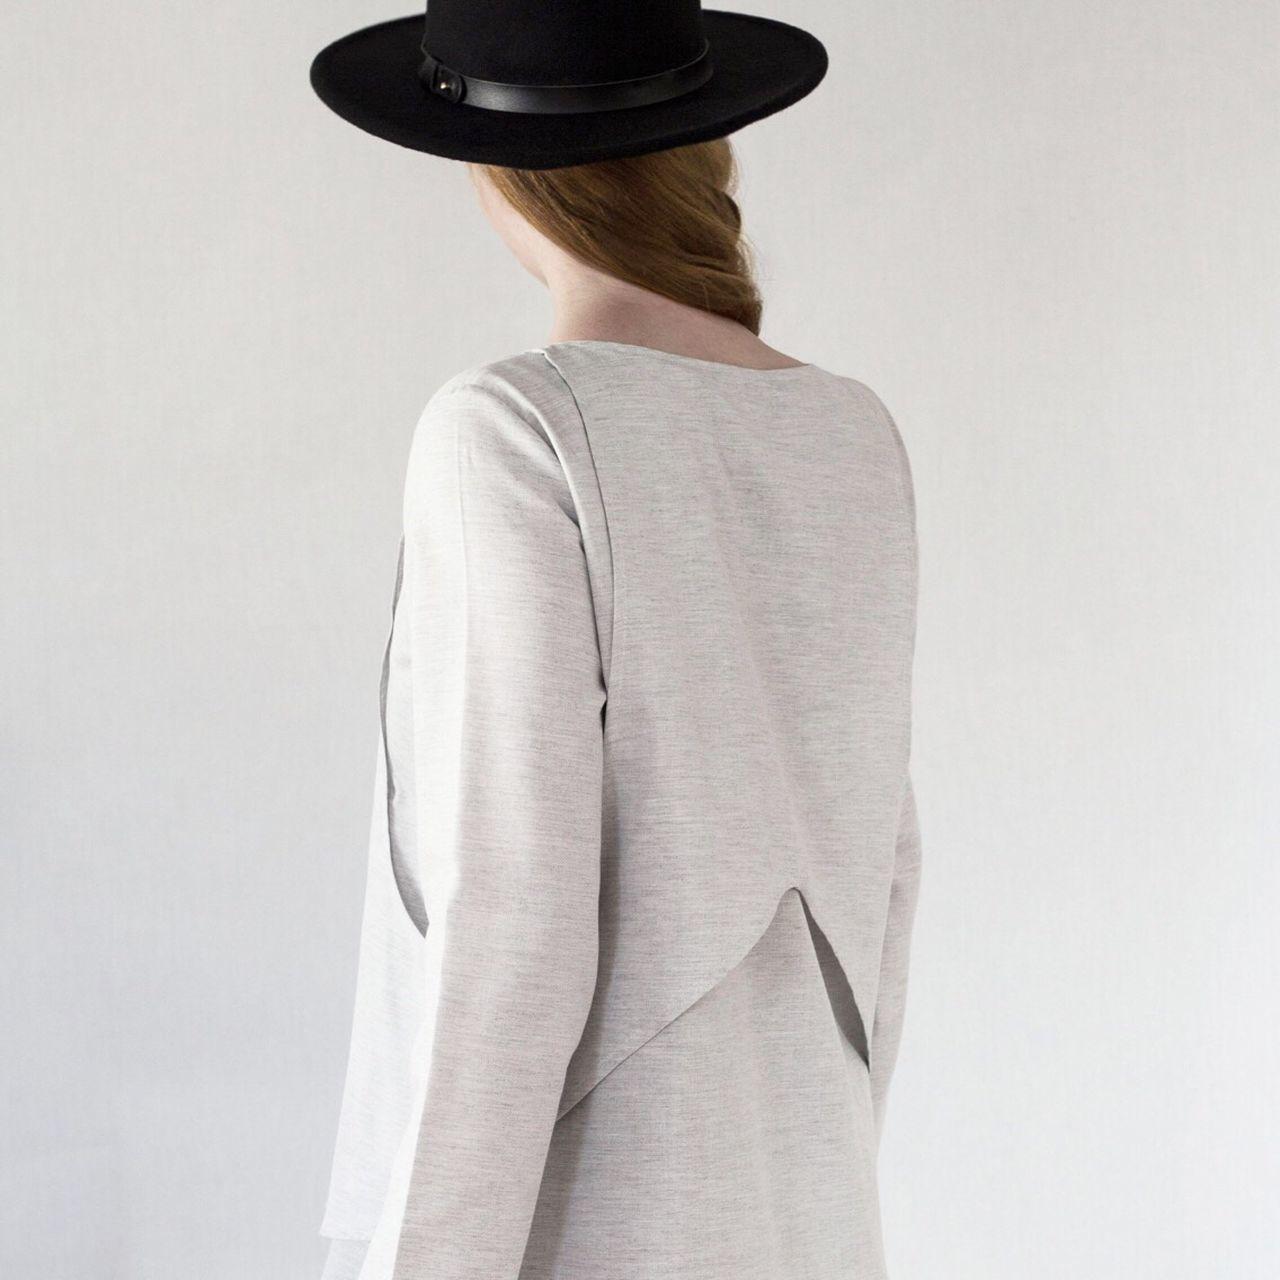 Fashion Editorial  Slowfashion Design SPAIN Contemporary Moody Girl Studio Shot Product EyeEm Best Shots EyeEm Gallery